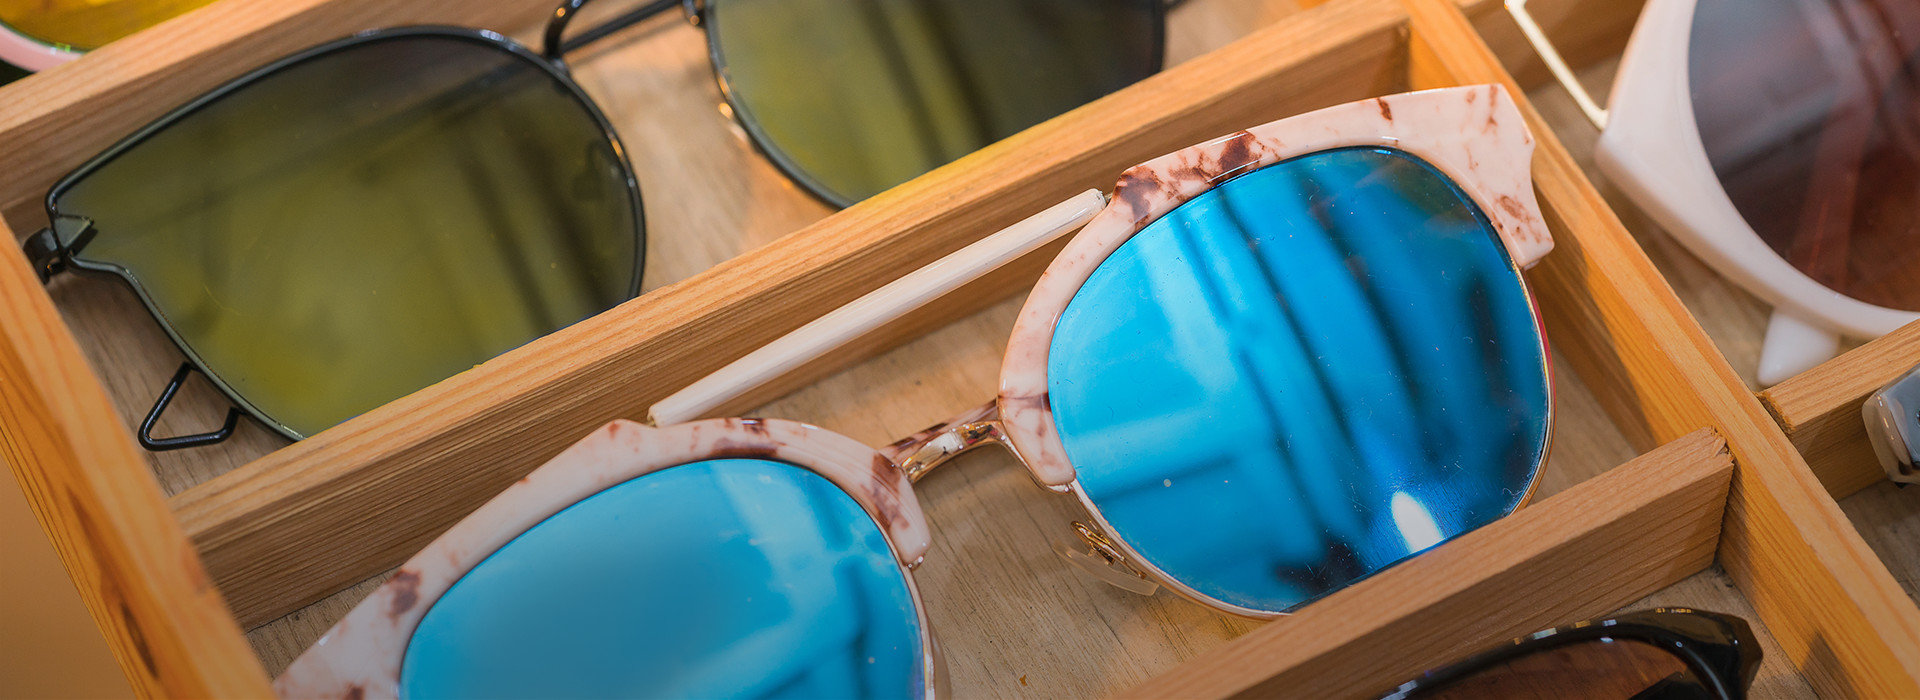 0f1207d0c5b5 Sunglasses | Vivid Eye Care | Cranston Market Optometry | Calgary